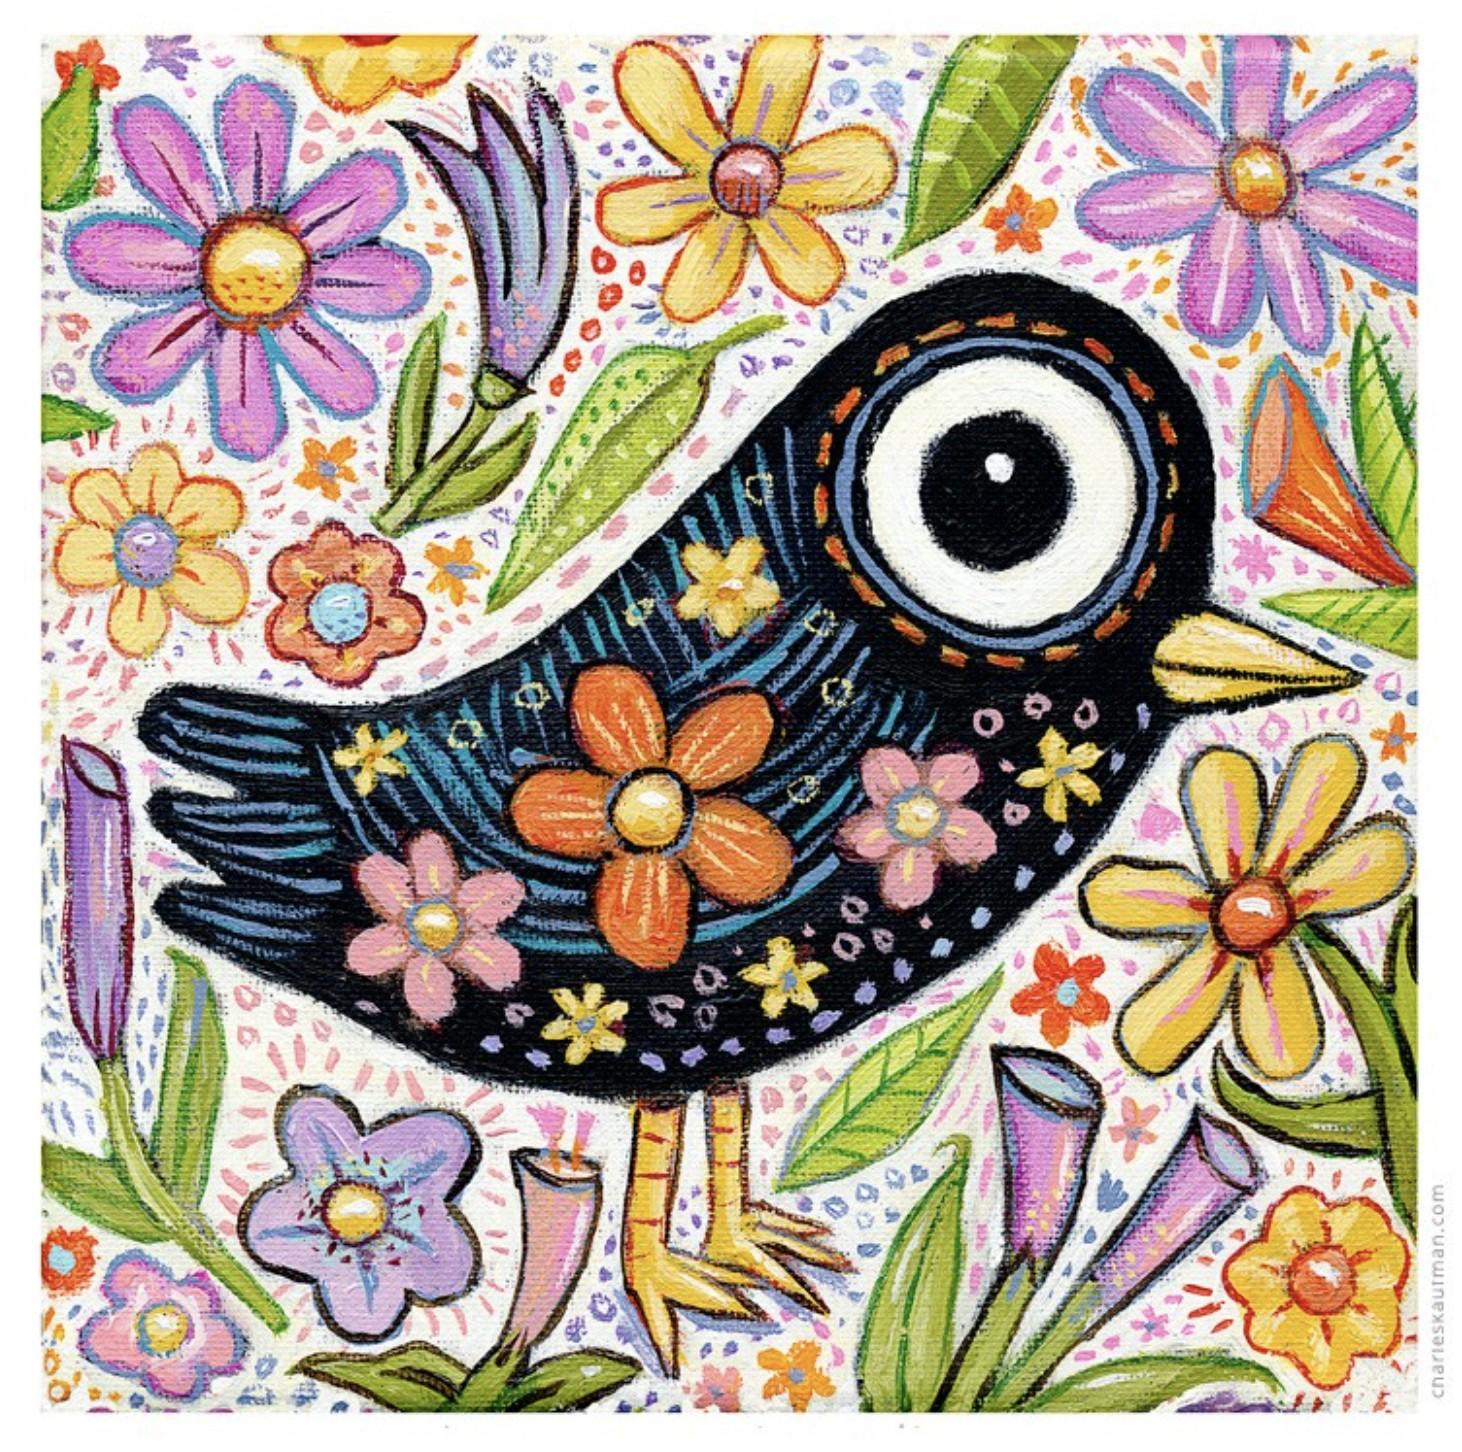 Bird and spring flowers - Kaufmann, Charles - k-CHK390